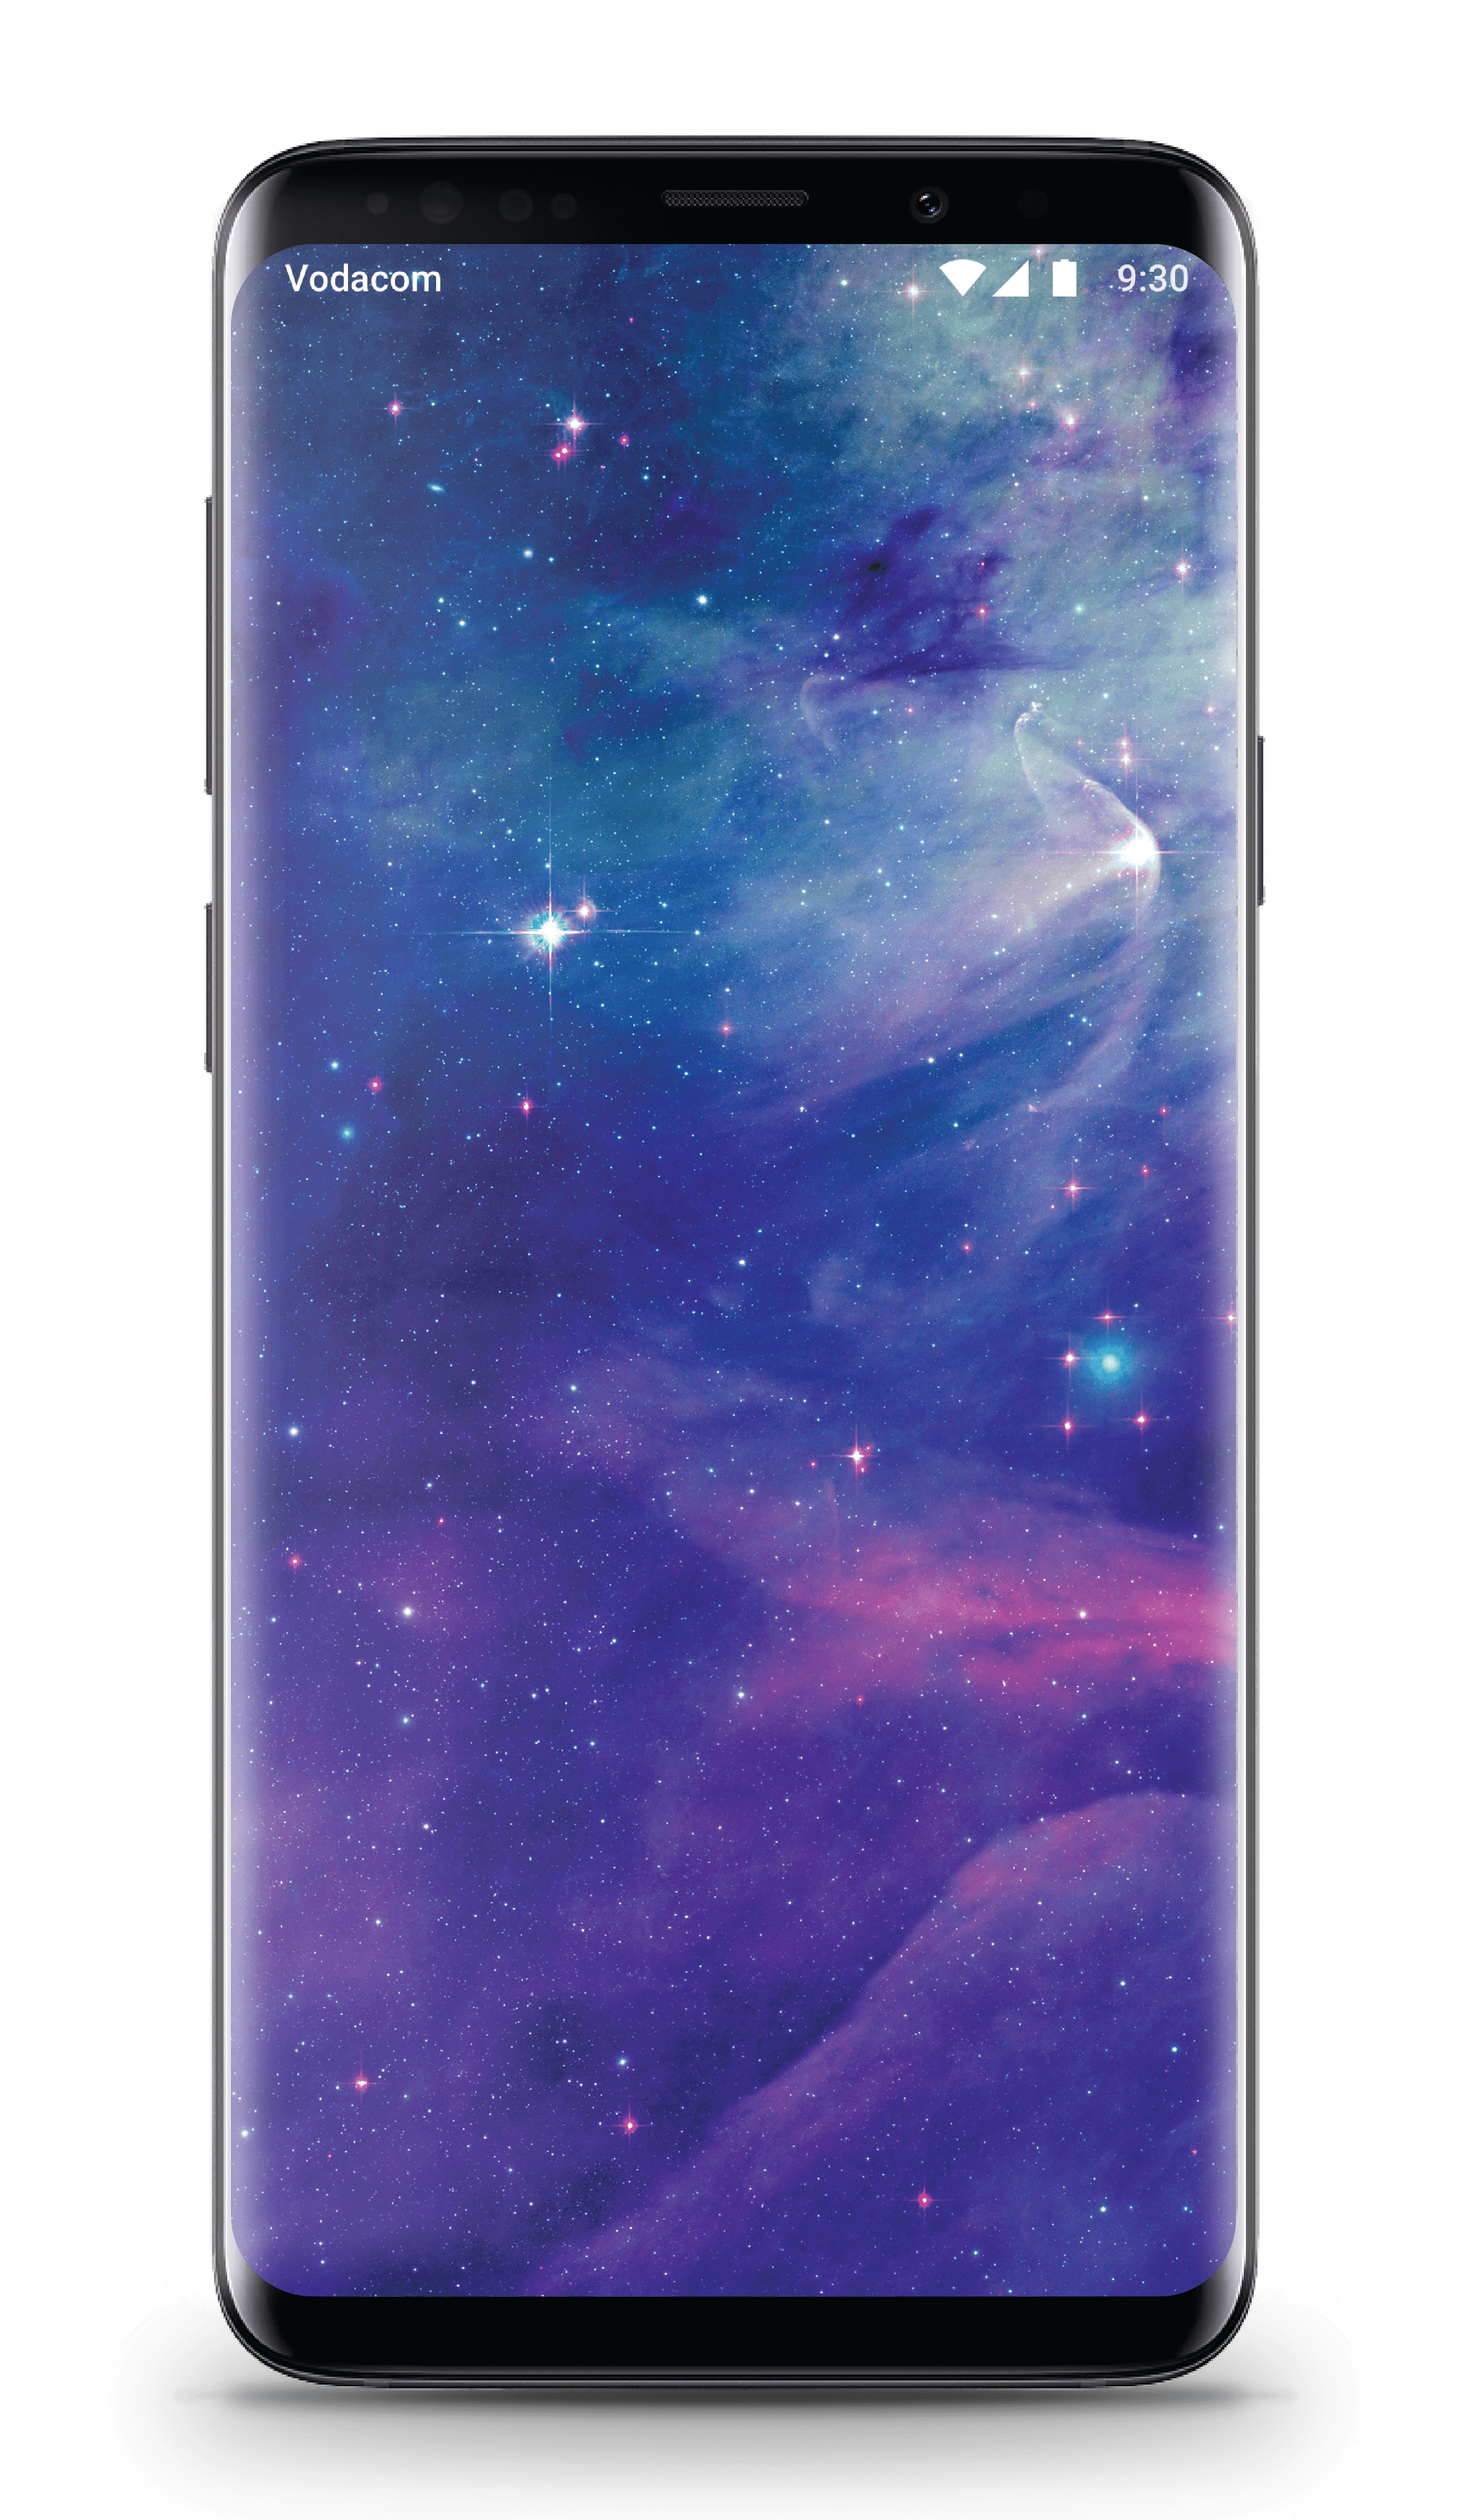 Samsung Galaxy S9+ image